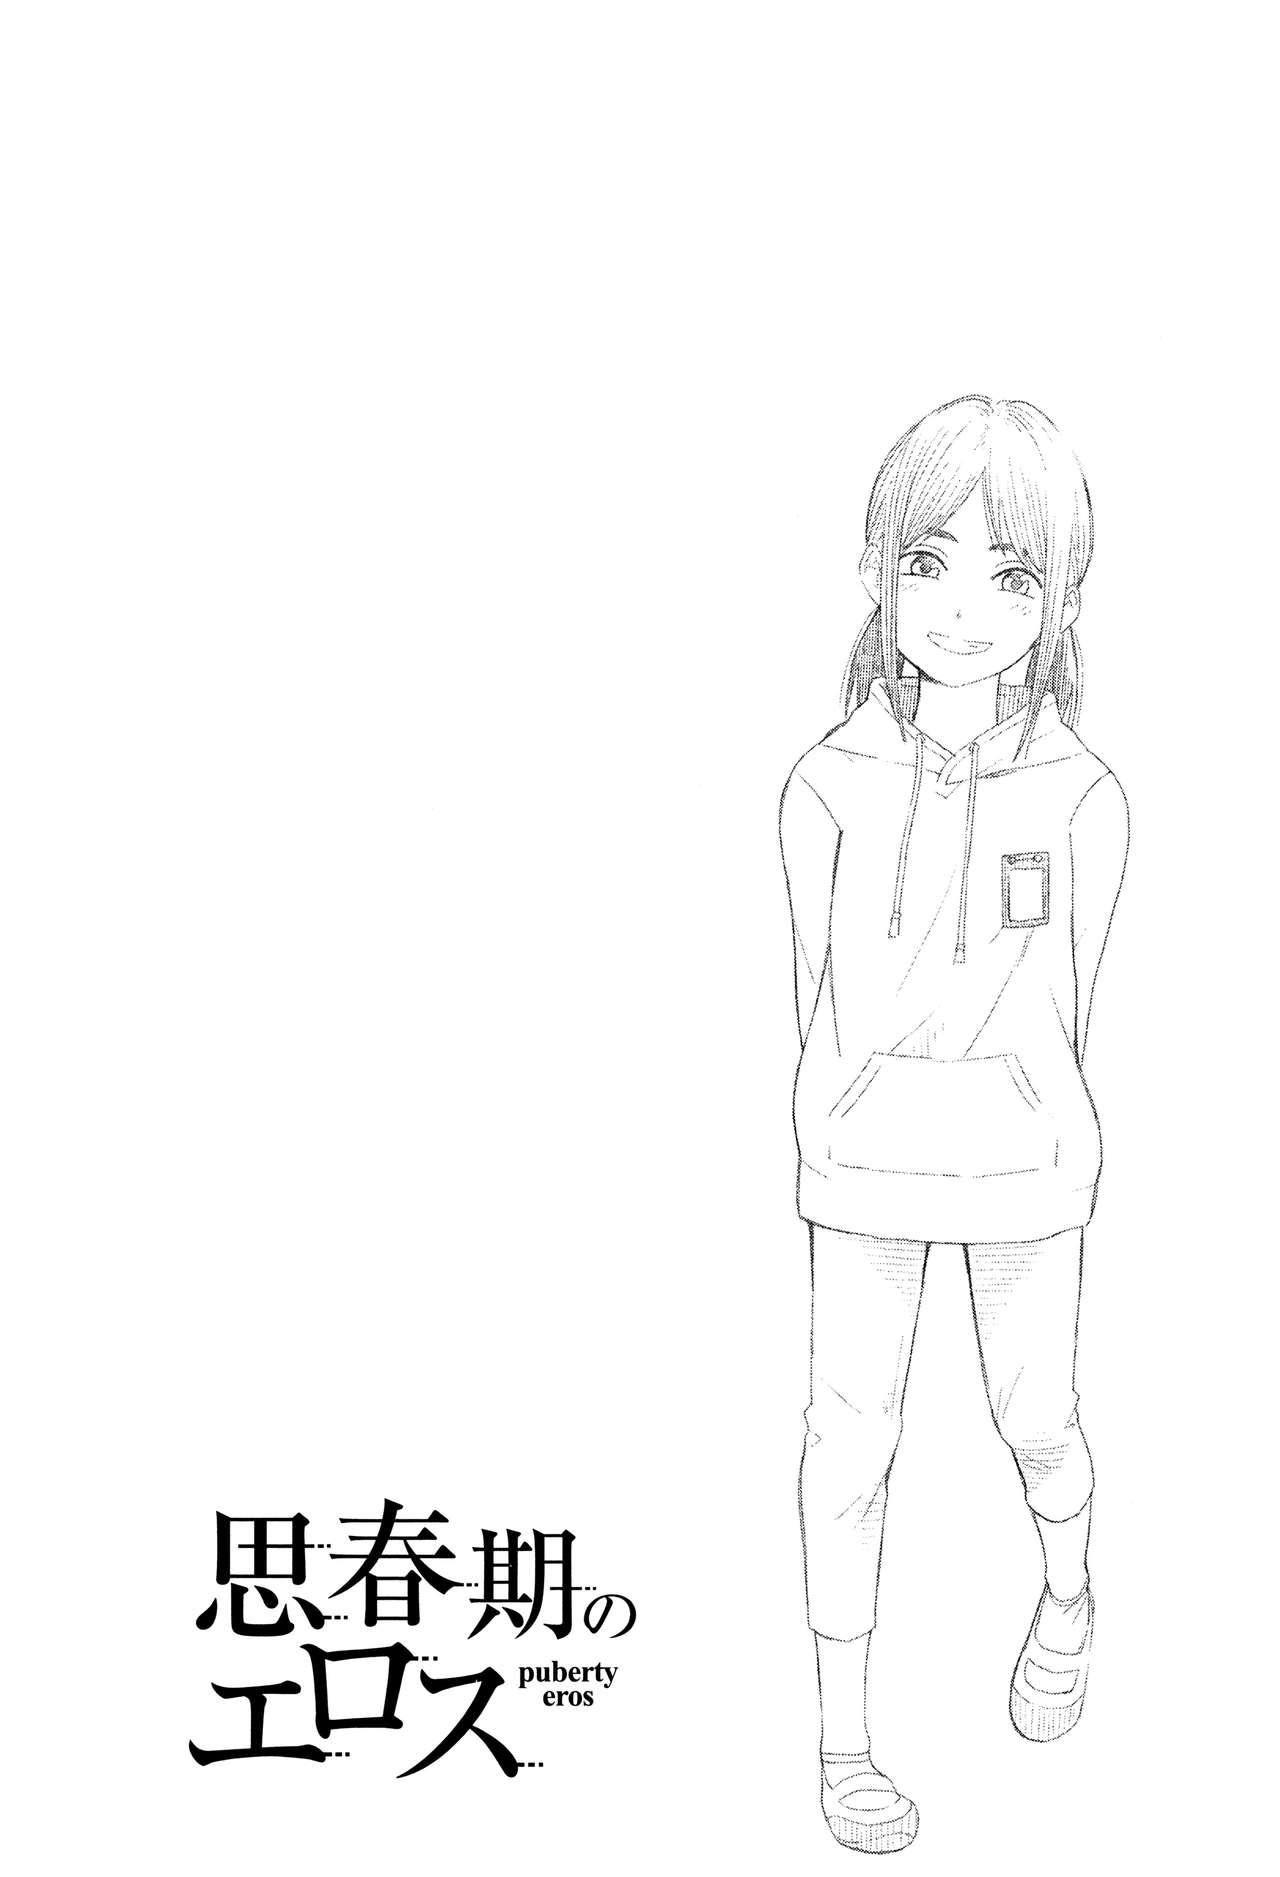 Shishunki no Eros - puberty eros 84